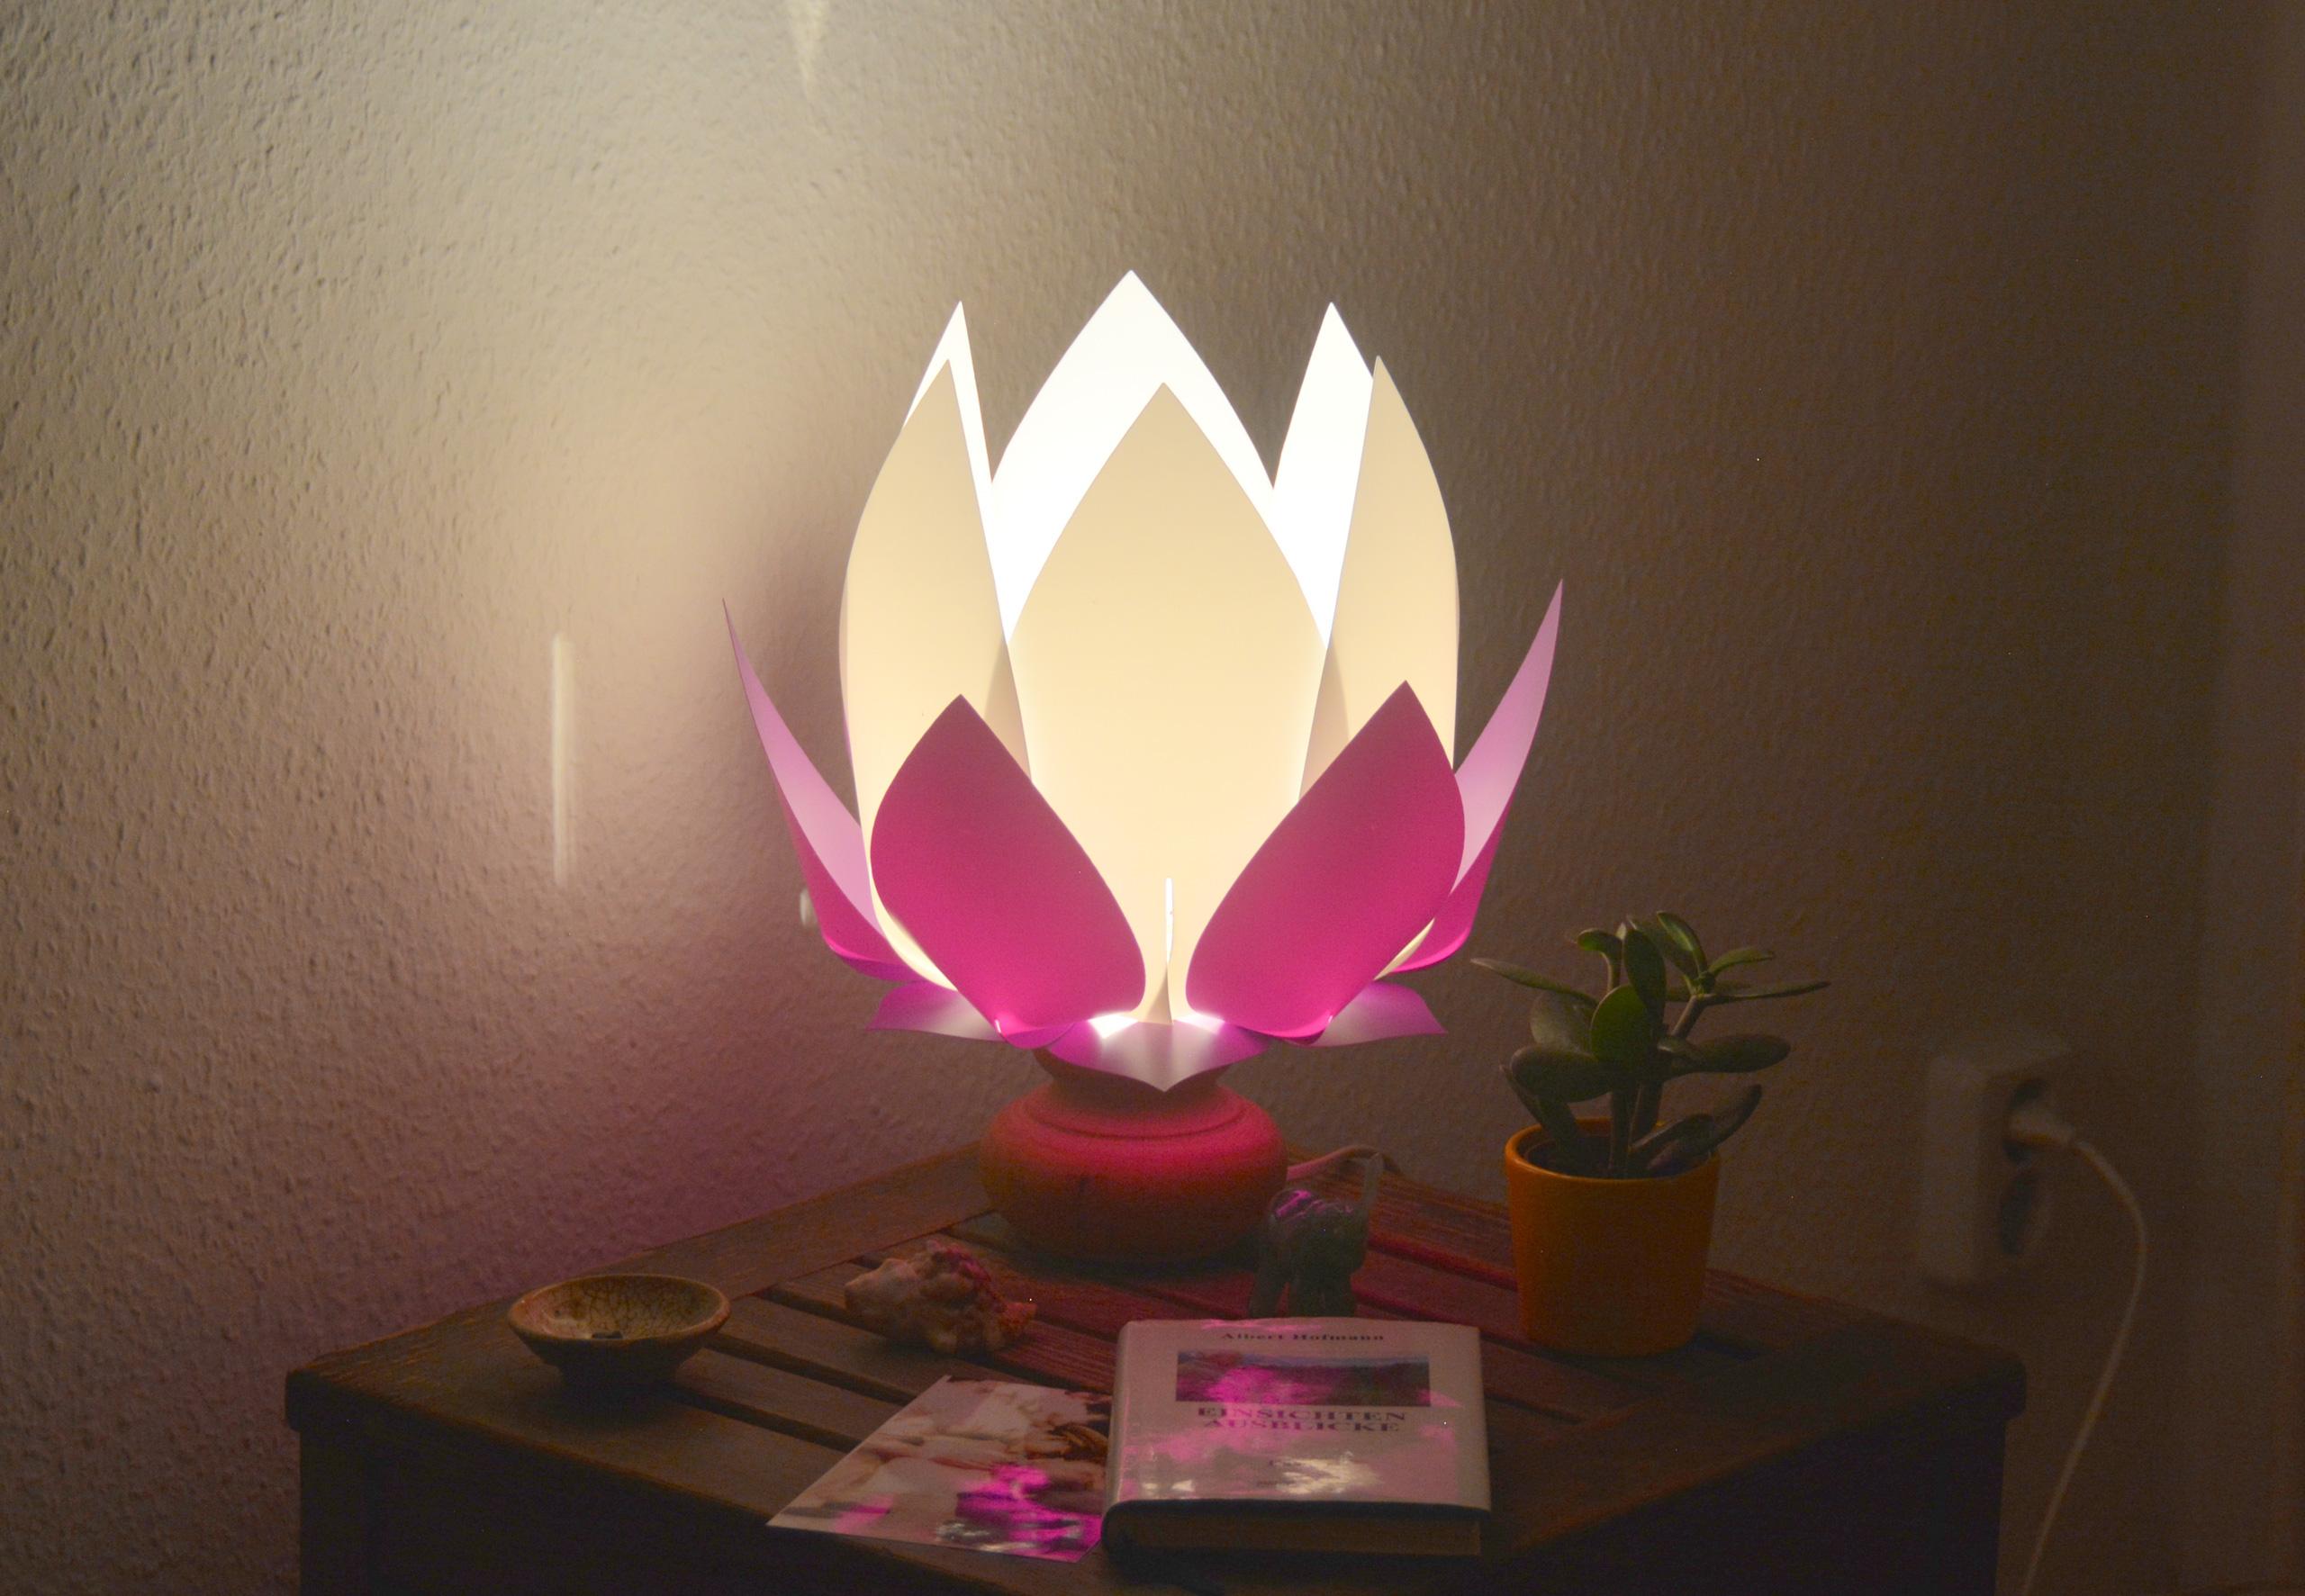 Lotus Flower Of Light